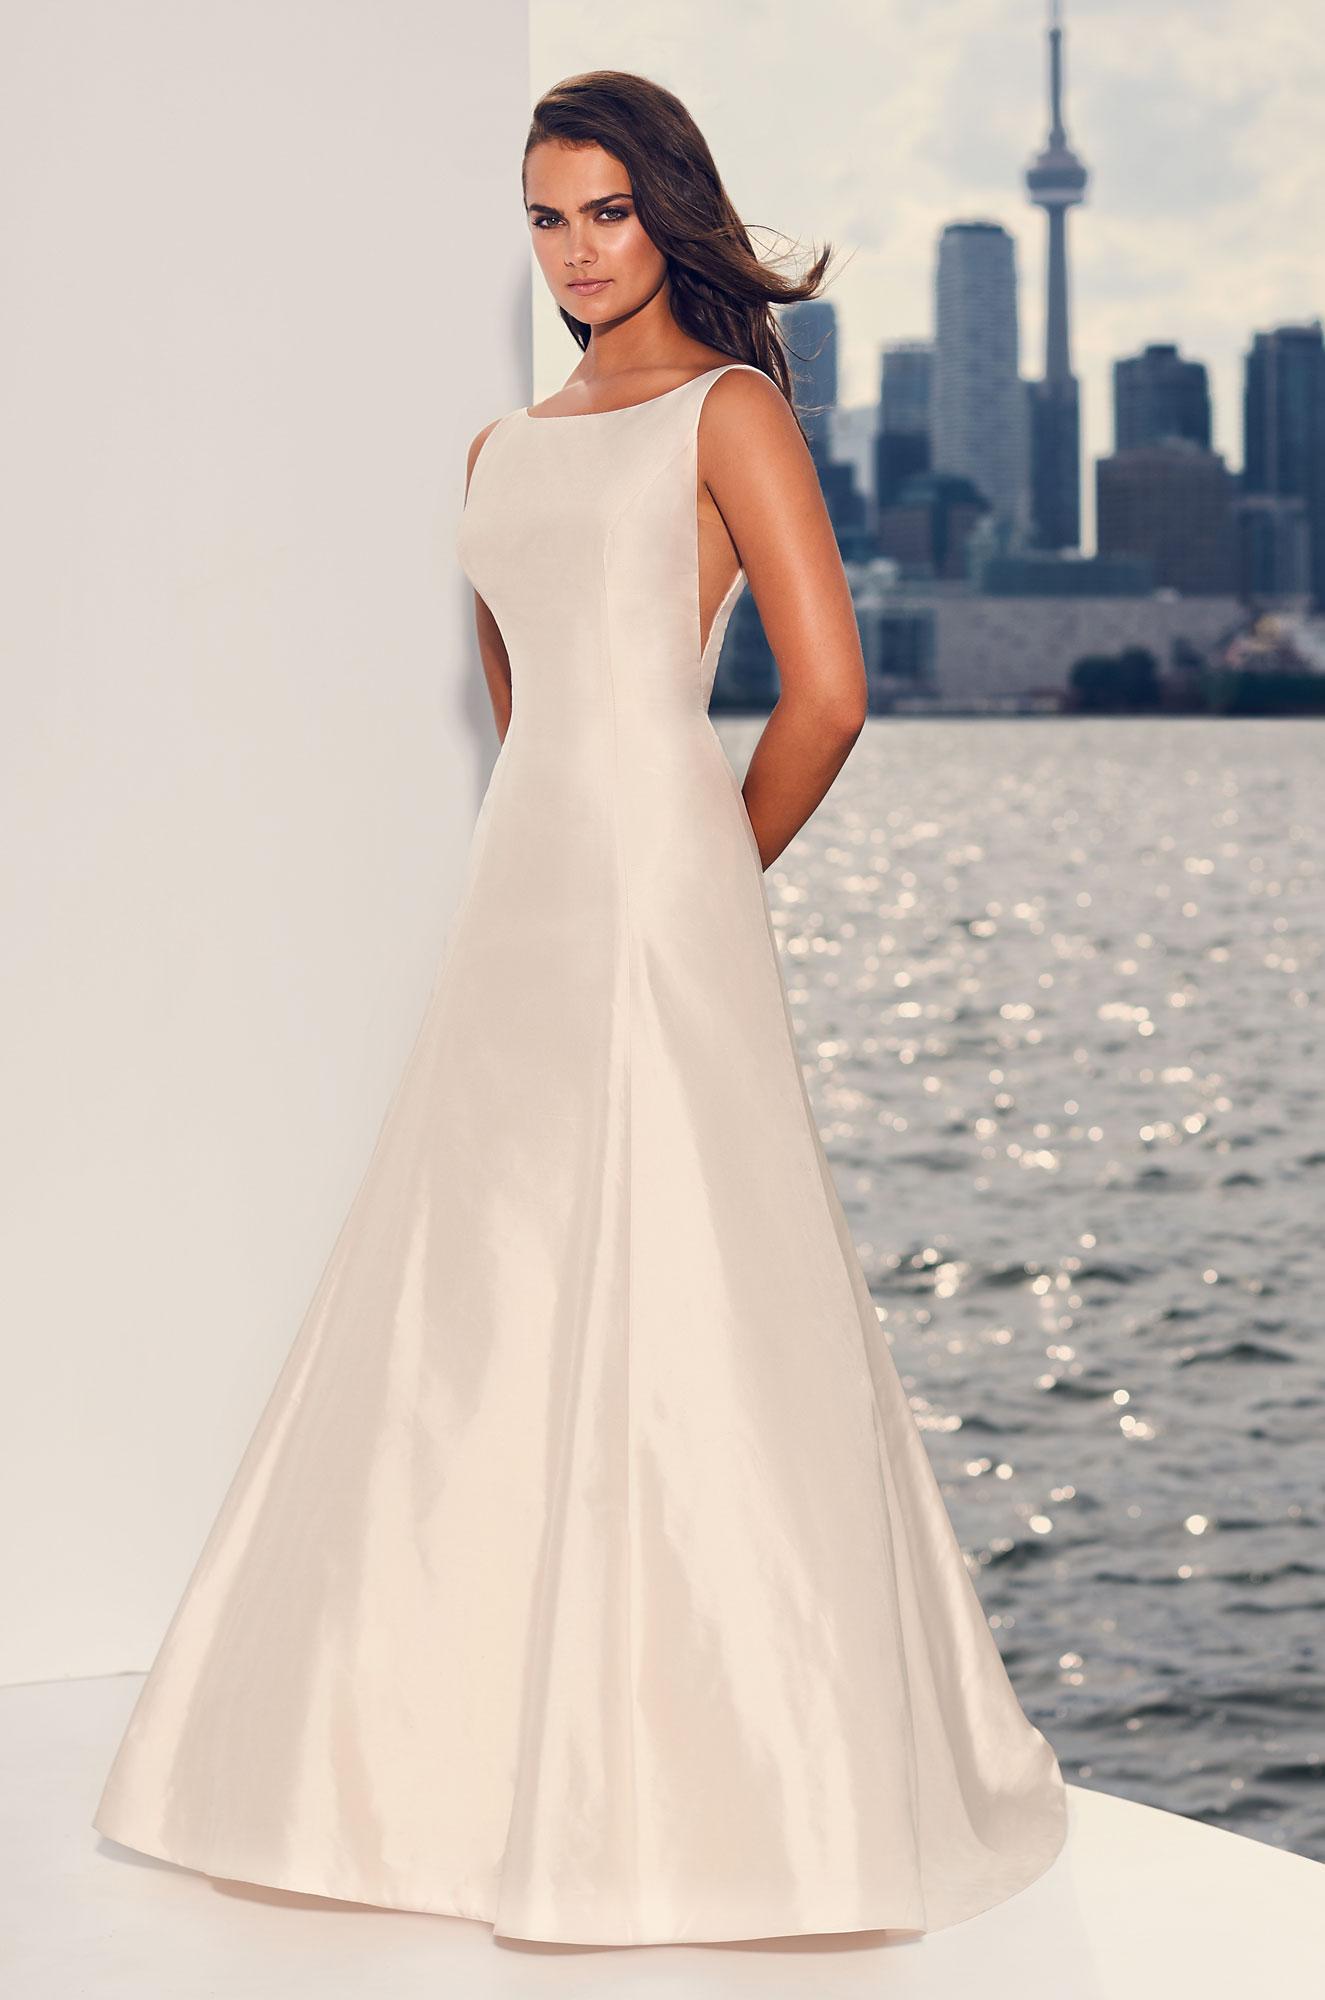 Off the rack Wedding Dress Sample Sale Clearance